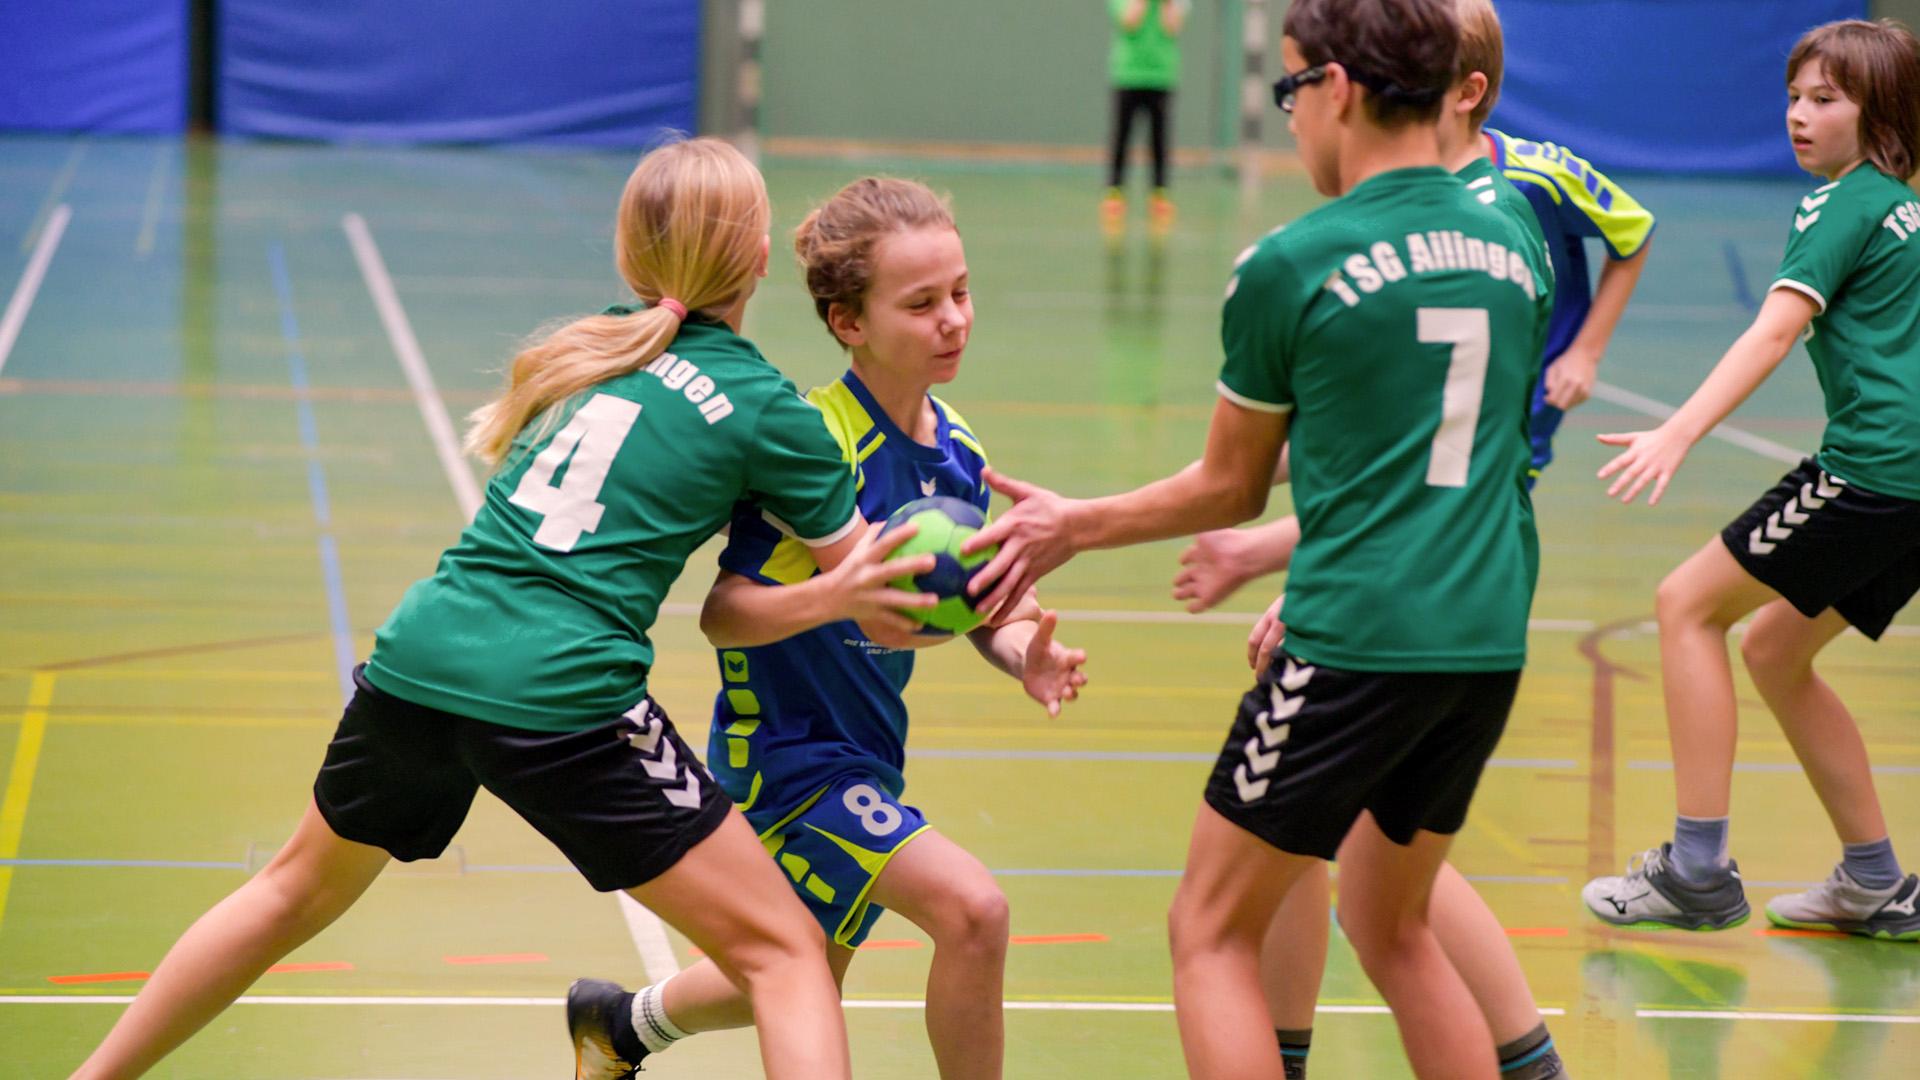 016Slider_mD_tsg_leutkirch_handball